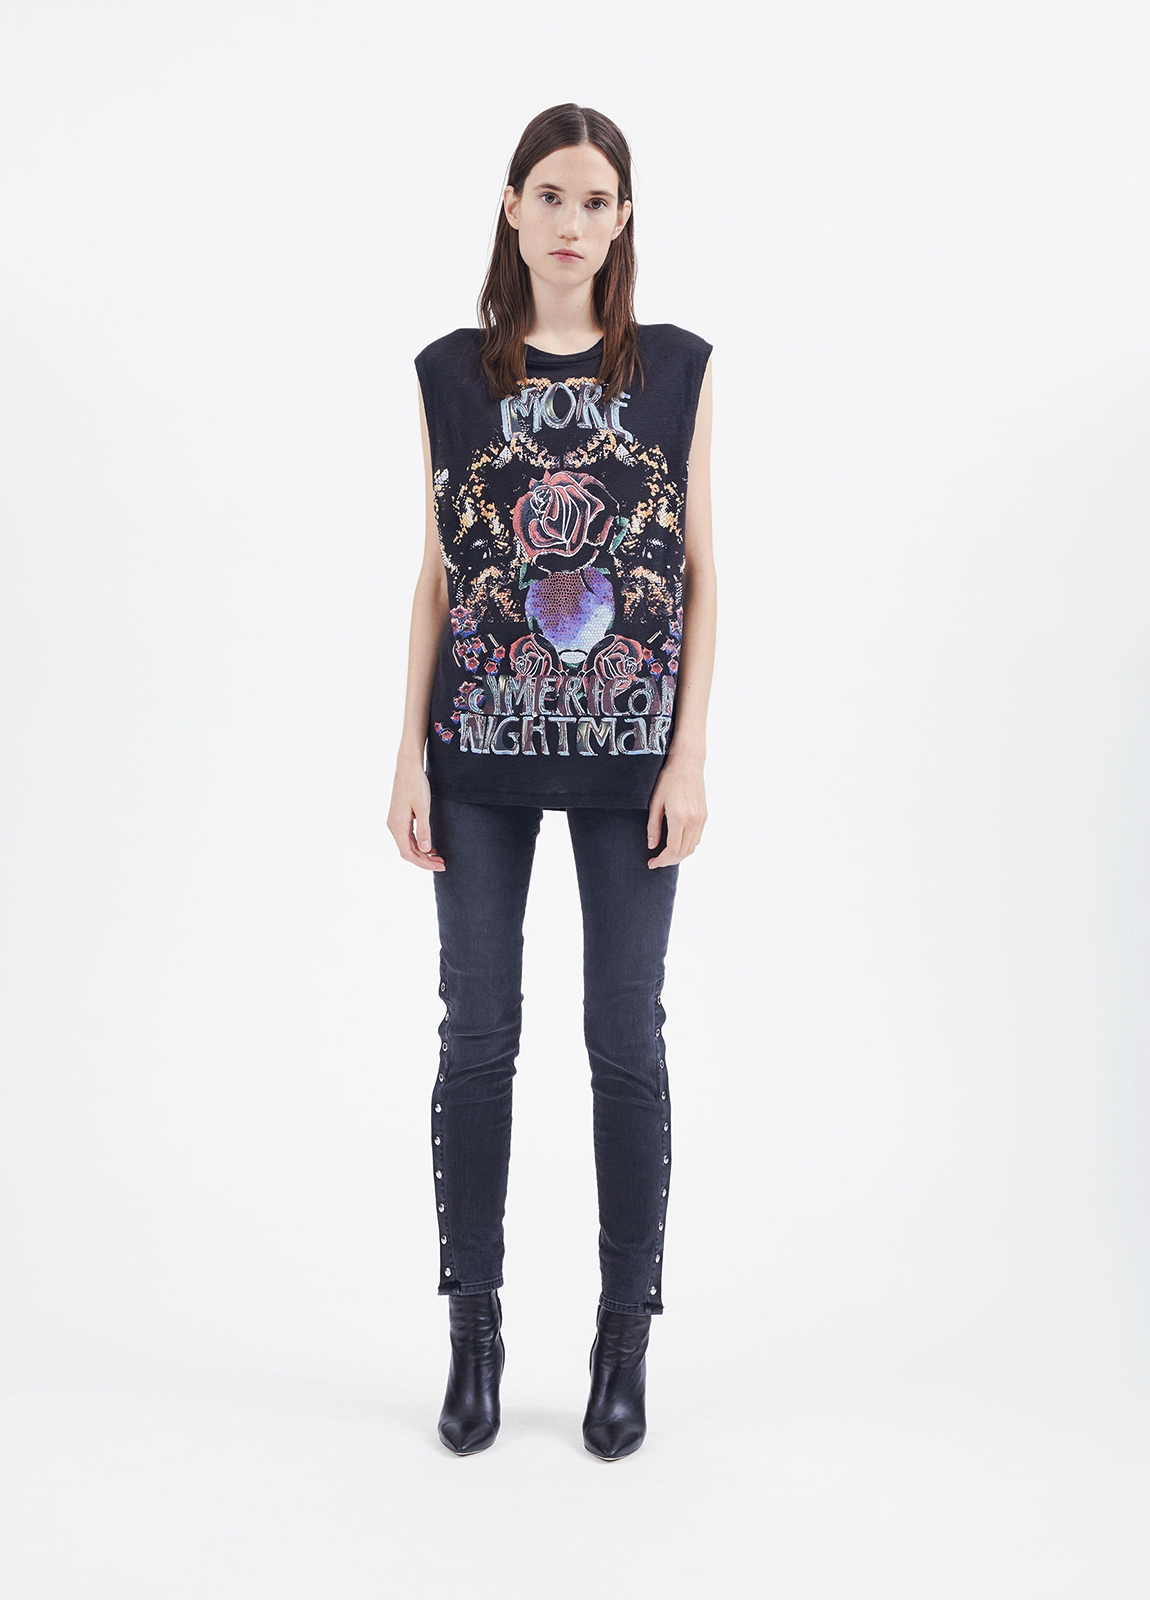 Camiseta woman sin mangas color negro con dibujo frontal. 100% Lino.